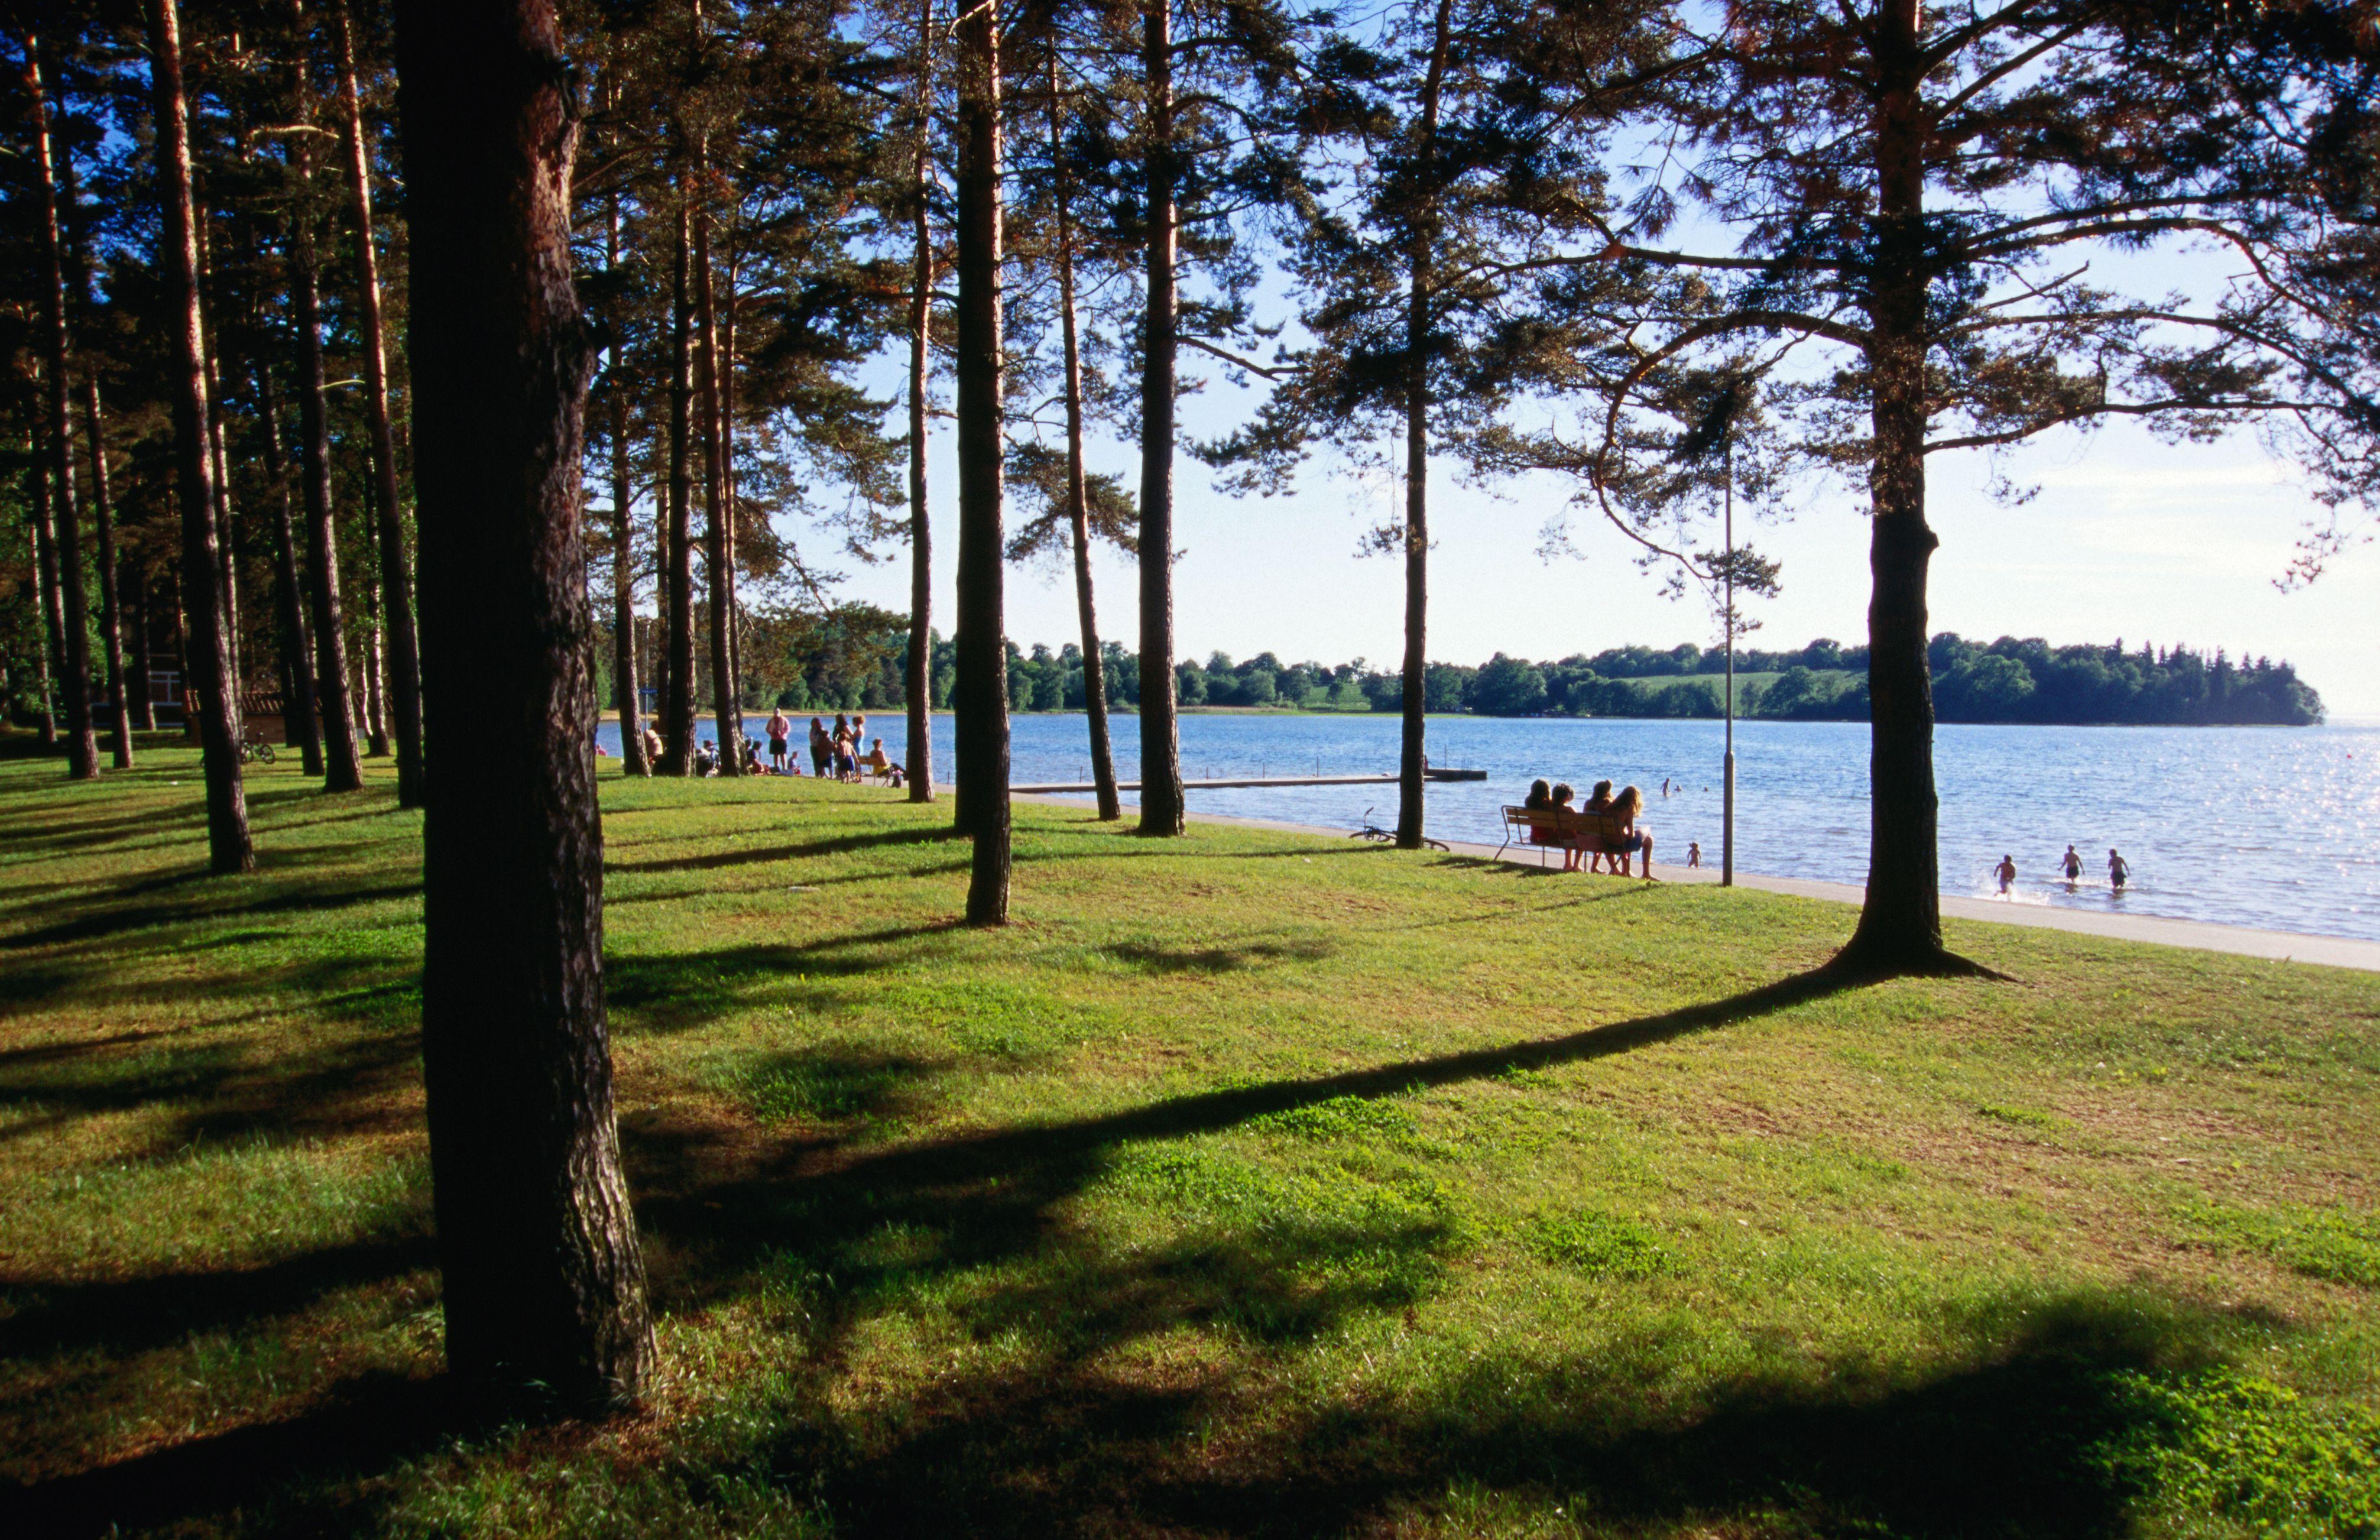 Pine forest lining Sweden's longest lake beach at Varamon, Lake Vattern